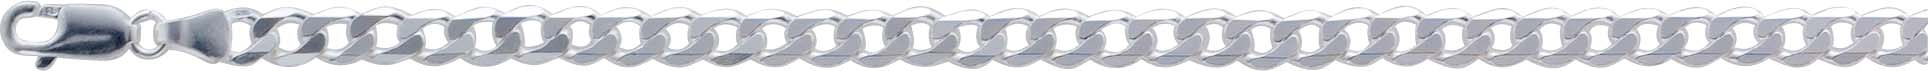 UNO A ERRE Panzerkette Panzerarmband Herrenkette Herrenarmband Silberkette 925 Halskette 925 5mm 40 256477140